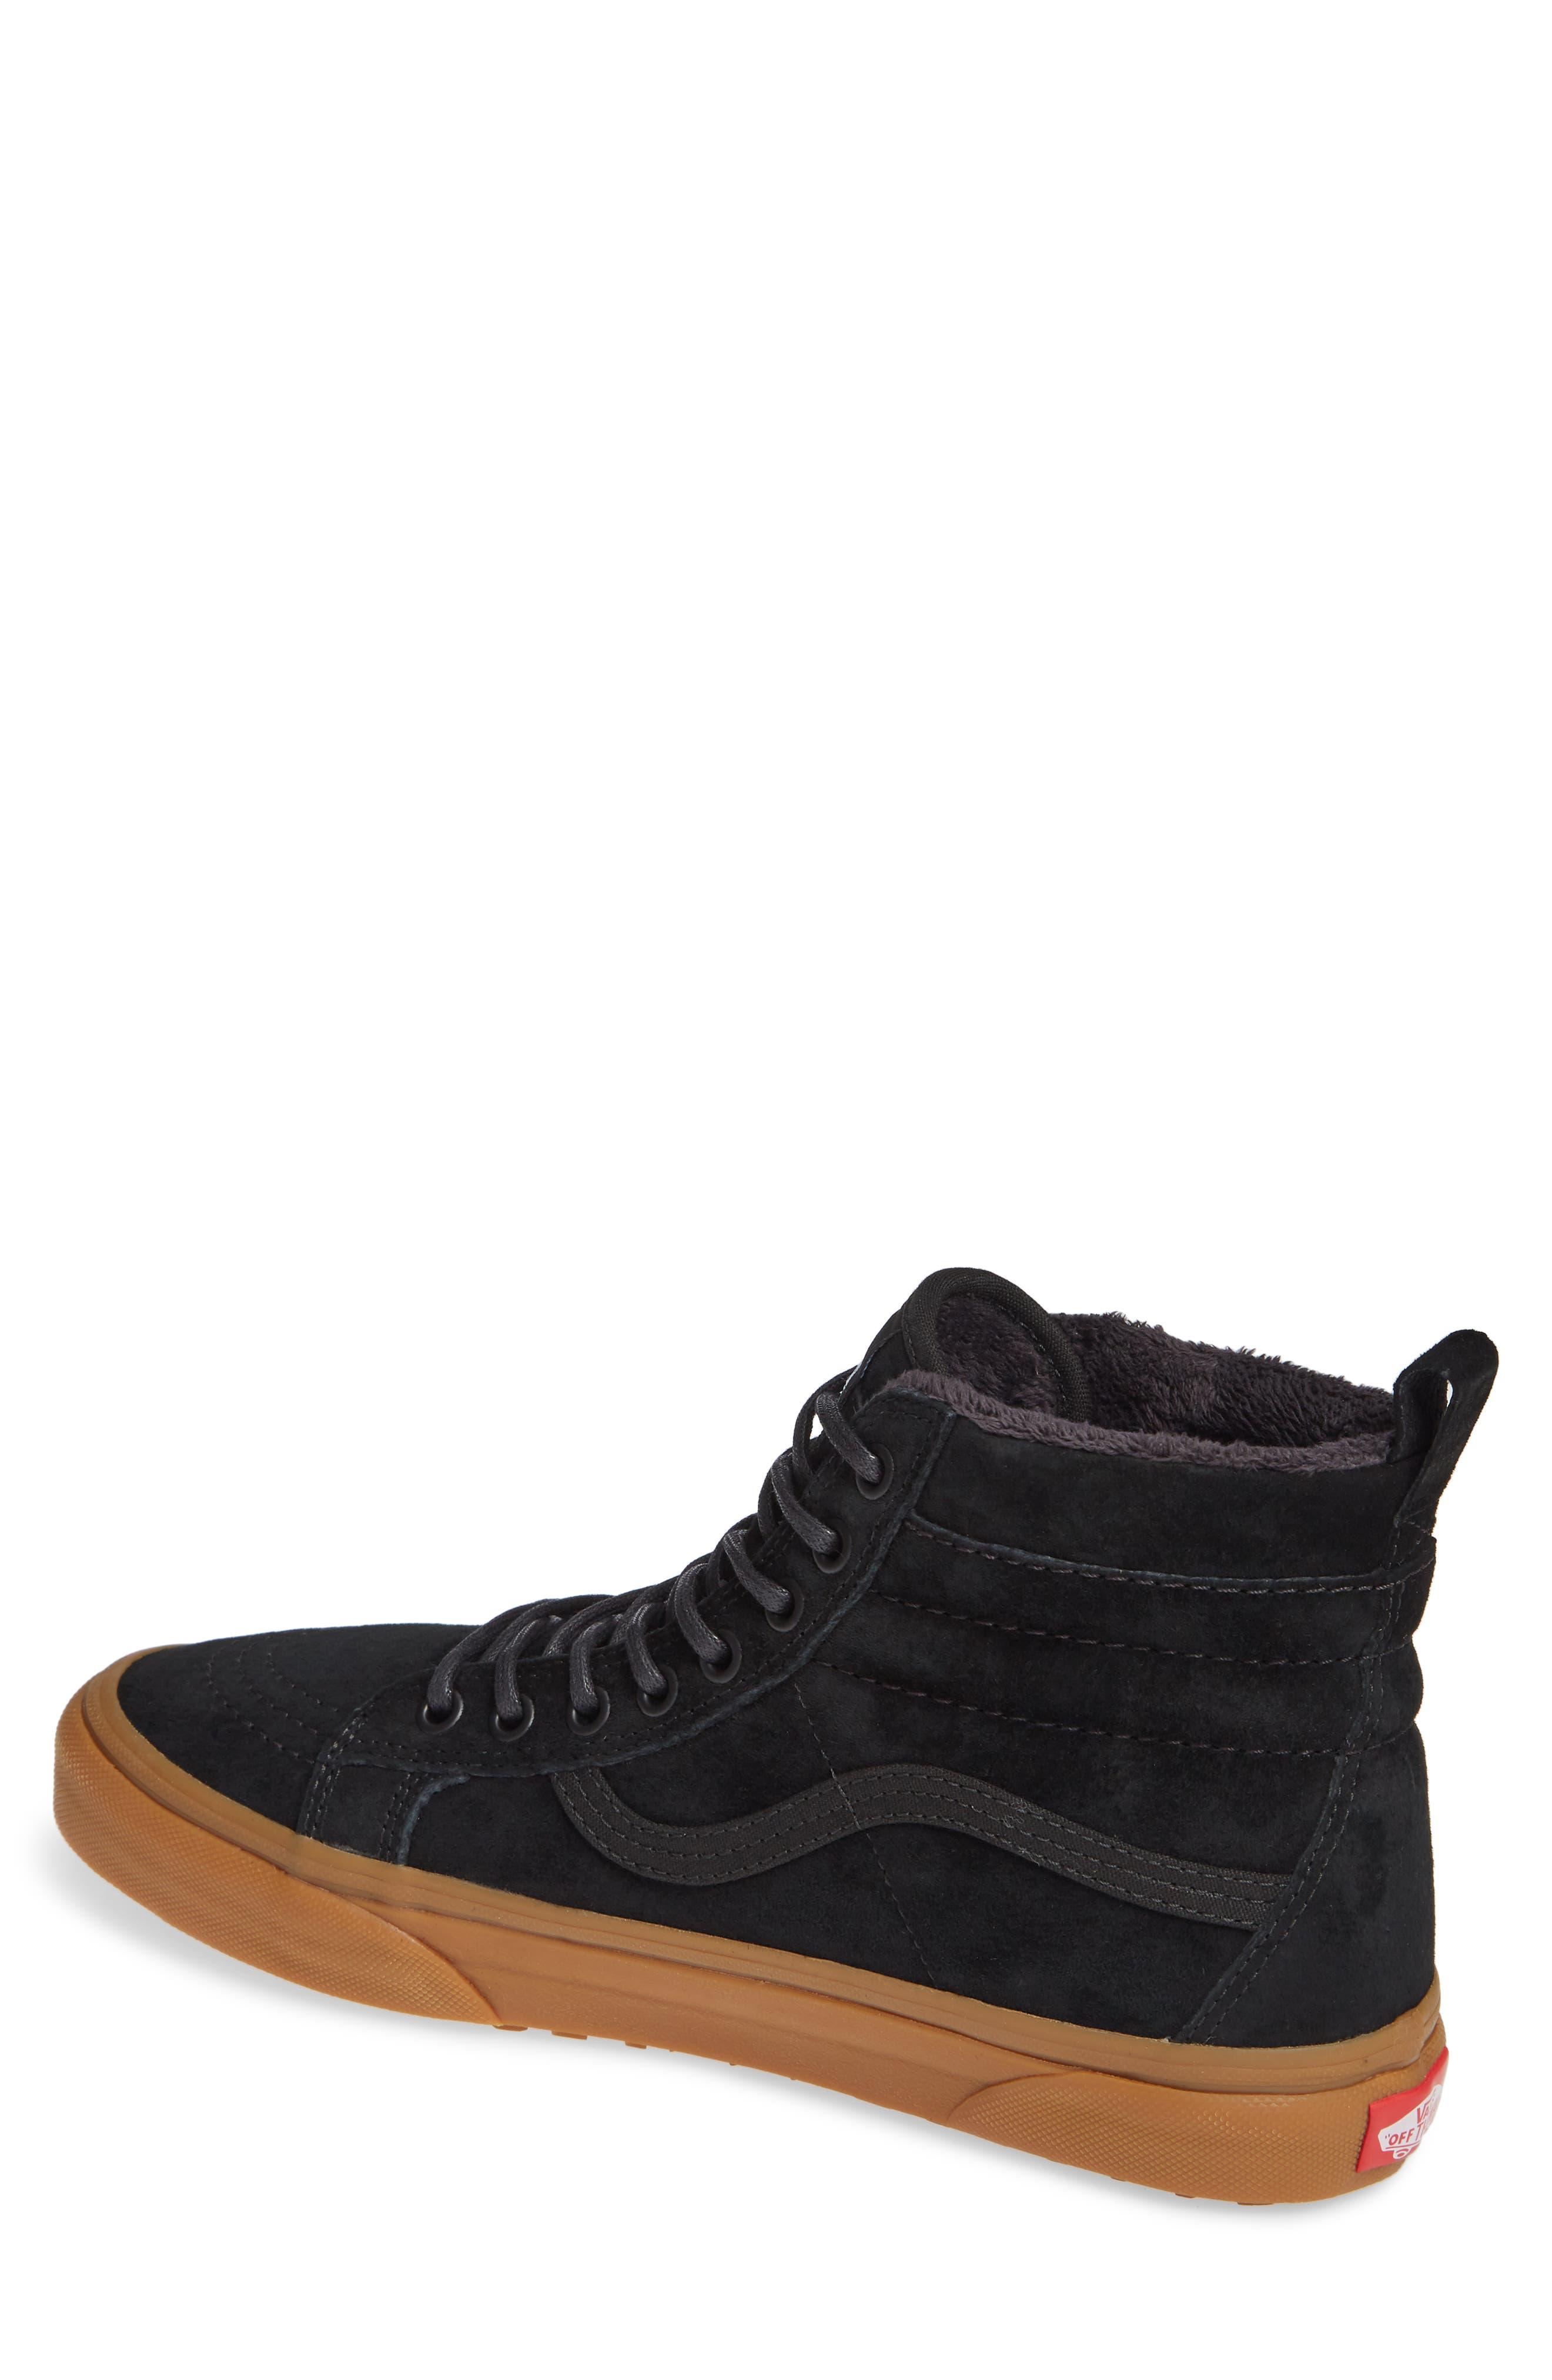 'Sk8-Hi MTE' Sneaker,                             Alternate thumbnail 2, color,                             BLACK/ GUM